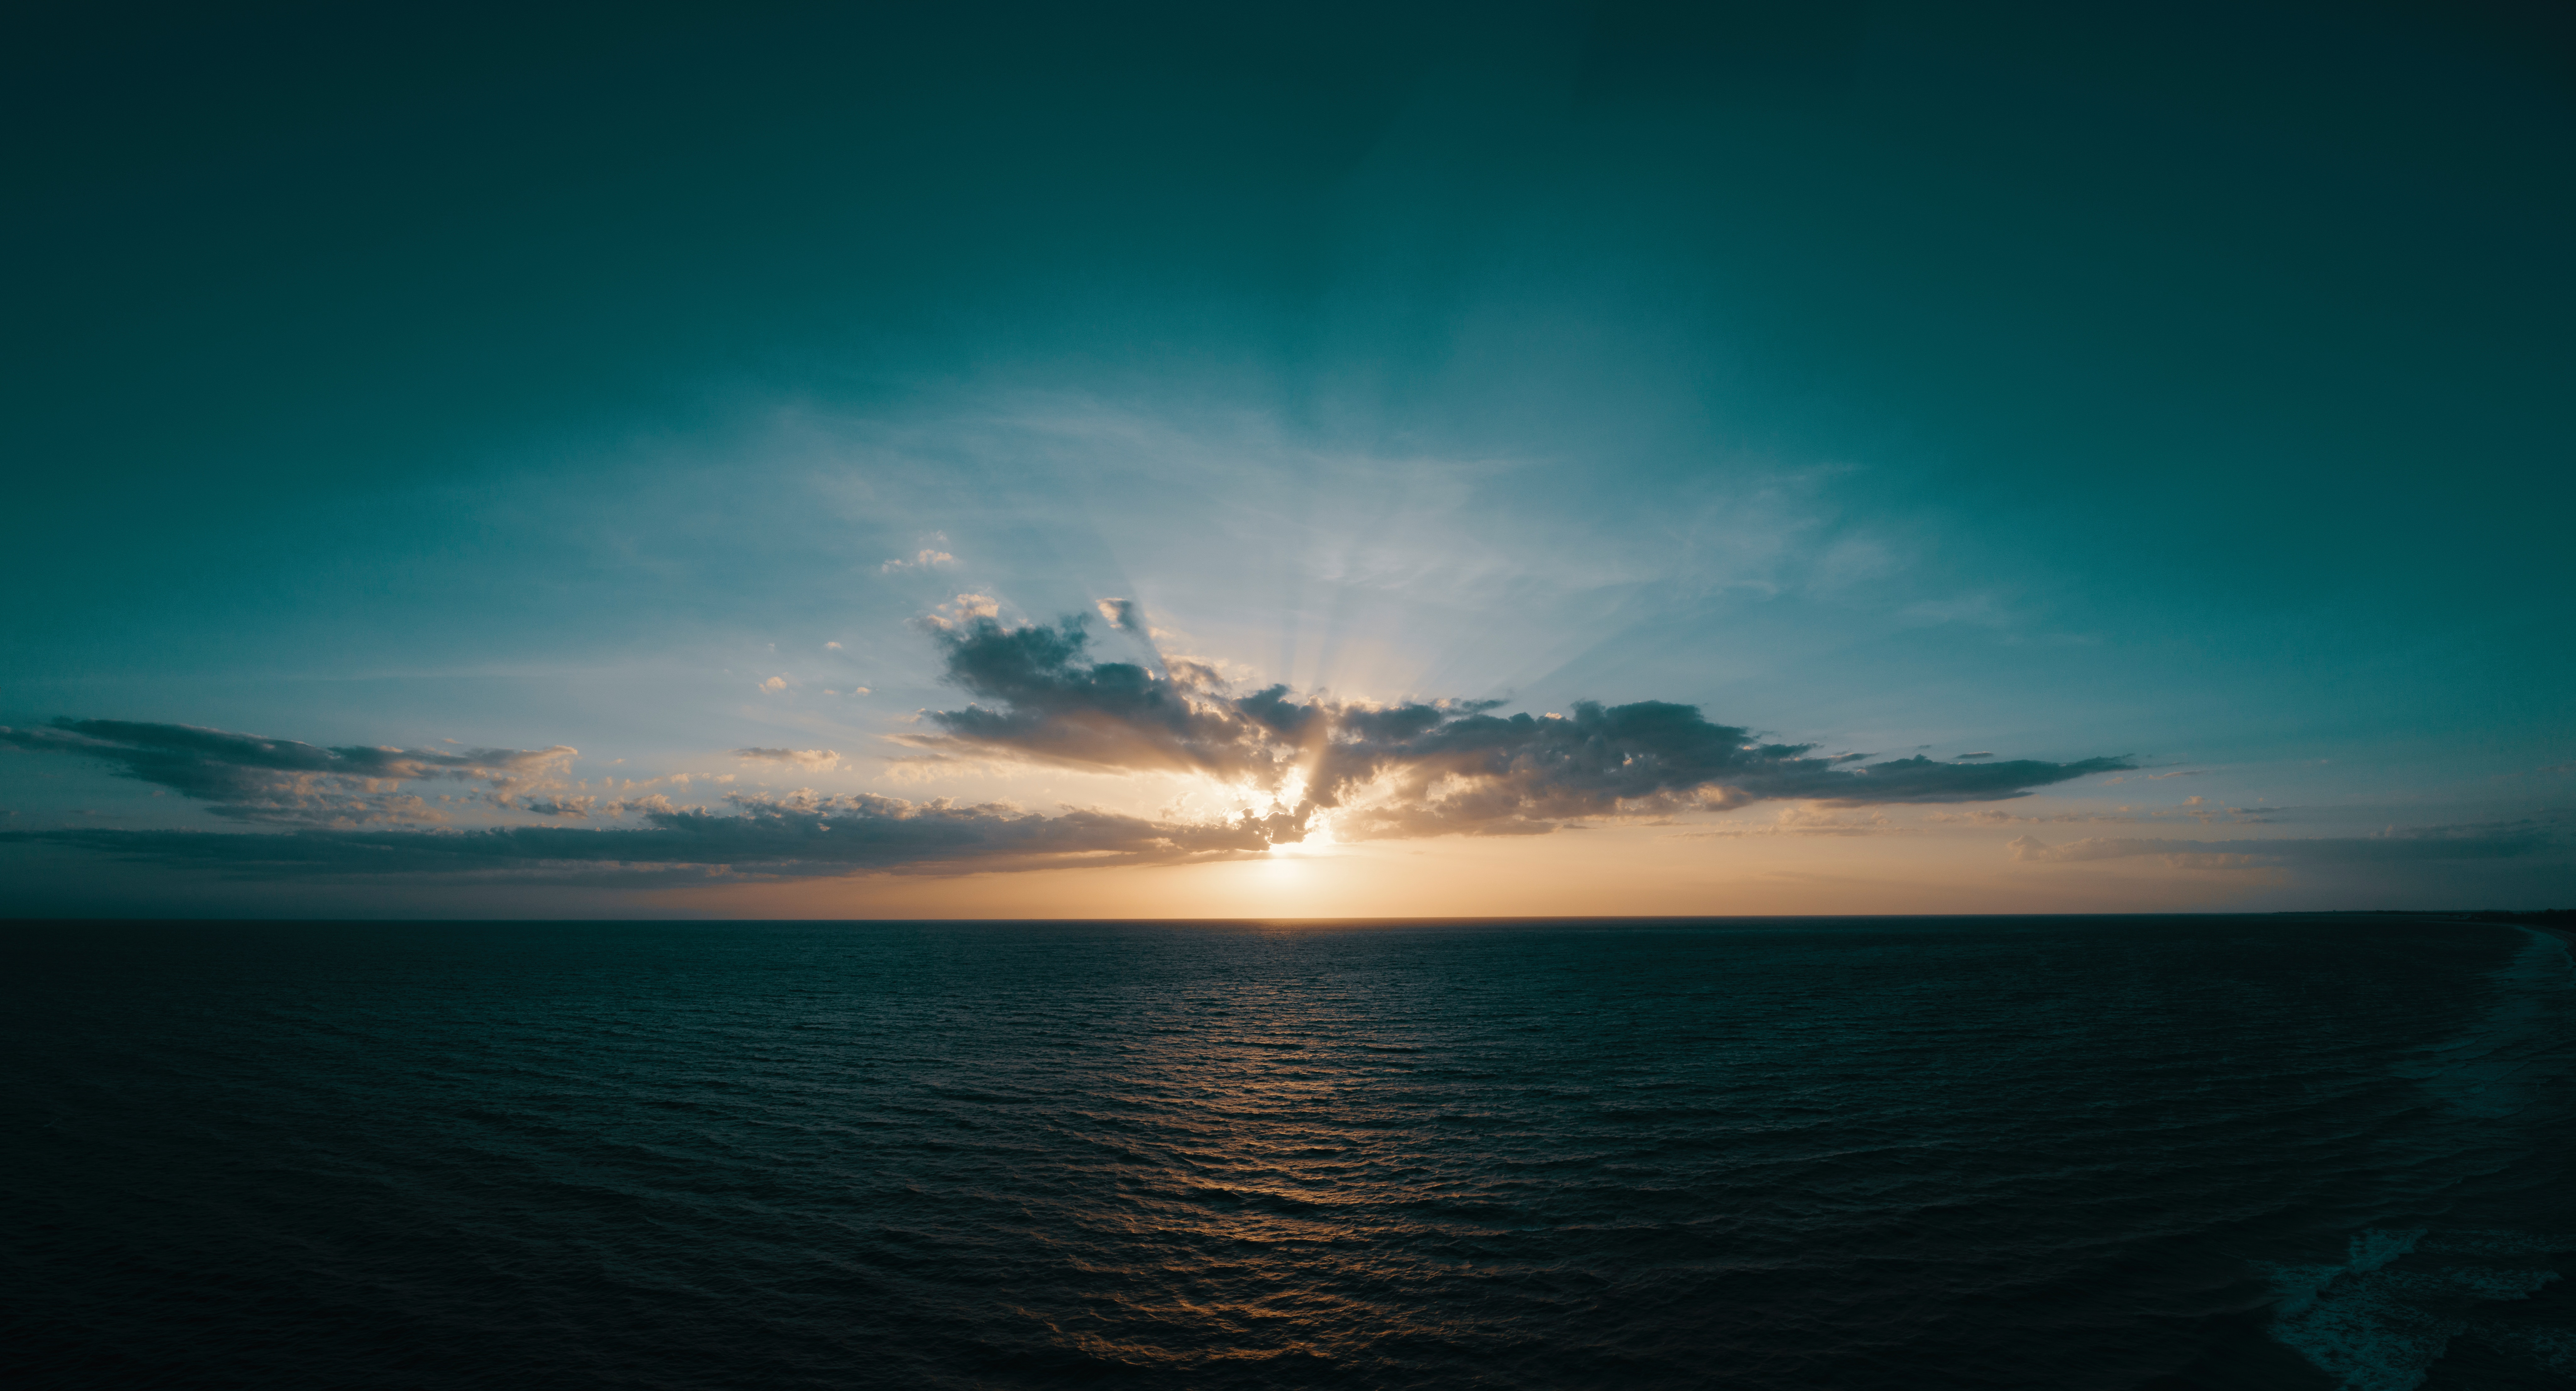 153092 Заставки и Обои Облака на телефон. Скачать Природа, Море, Горизонт, Восход, Облака картинки бесплатно